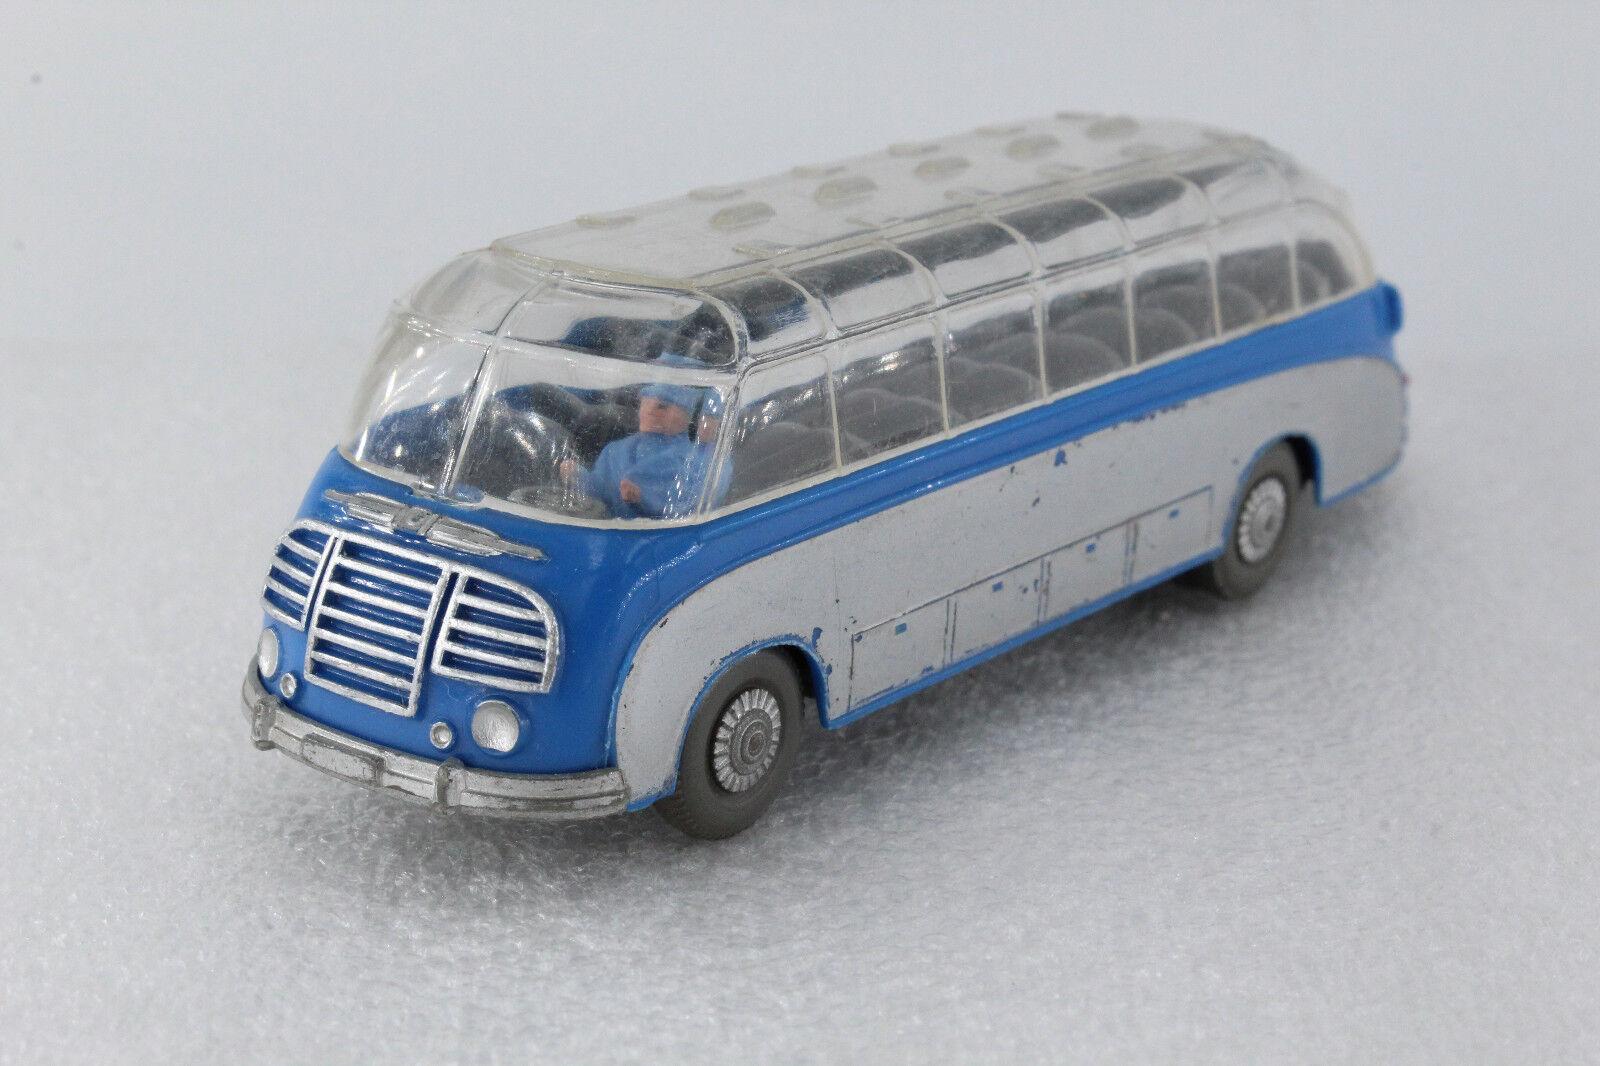 A.s.s Wiking edad autobús Setra azul cielo 1959 GK 730 3 CS 1166 2a 1 wtop